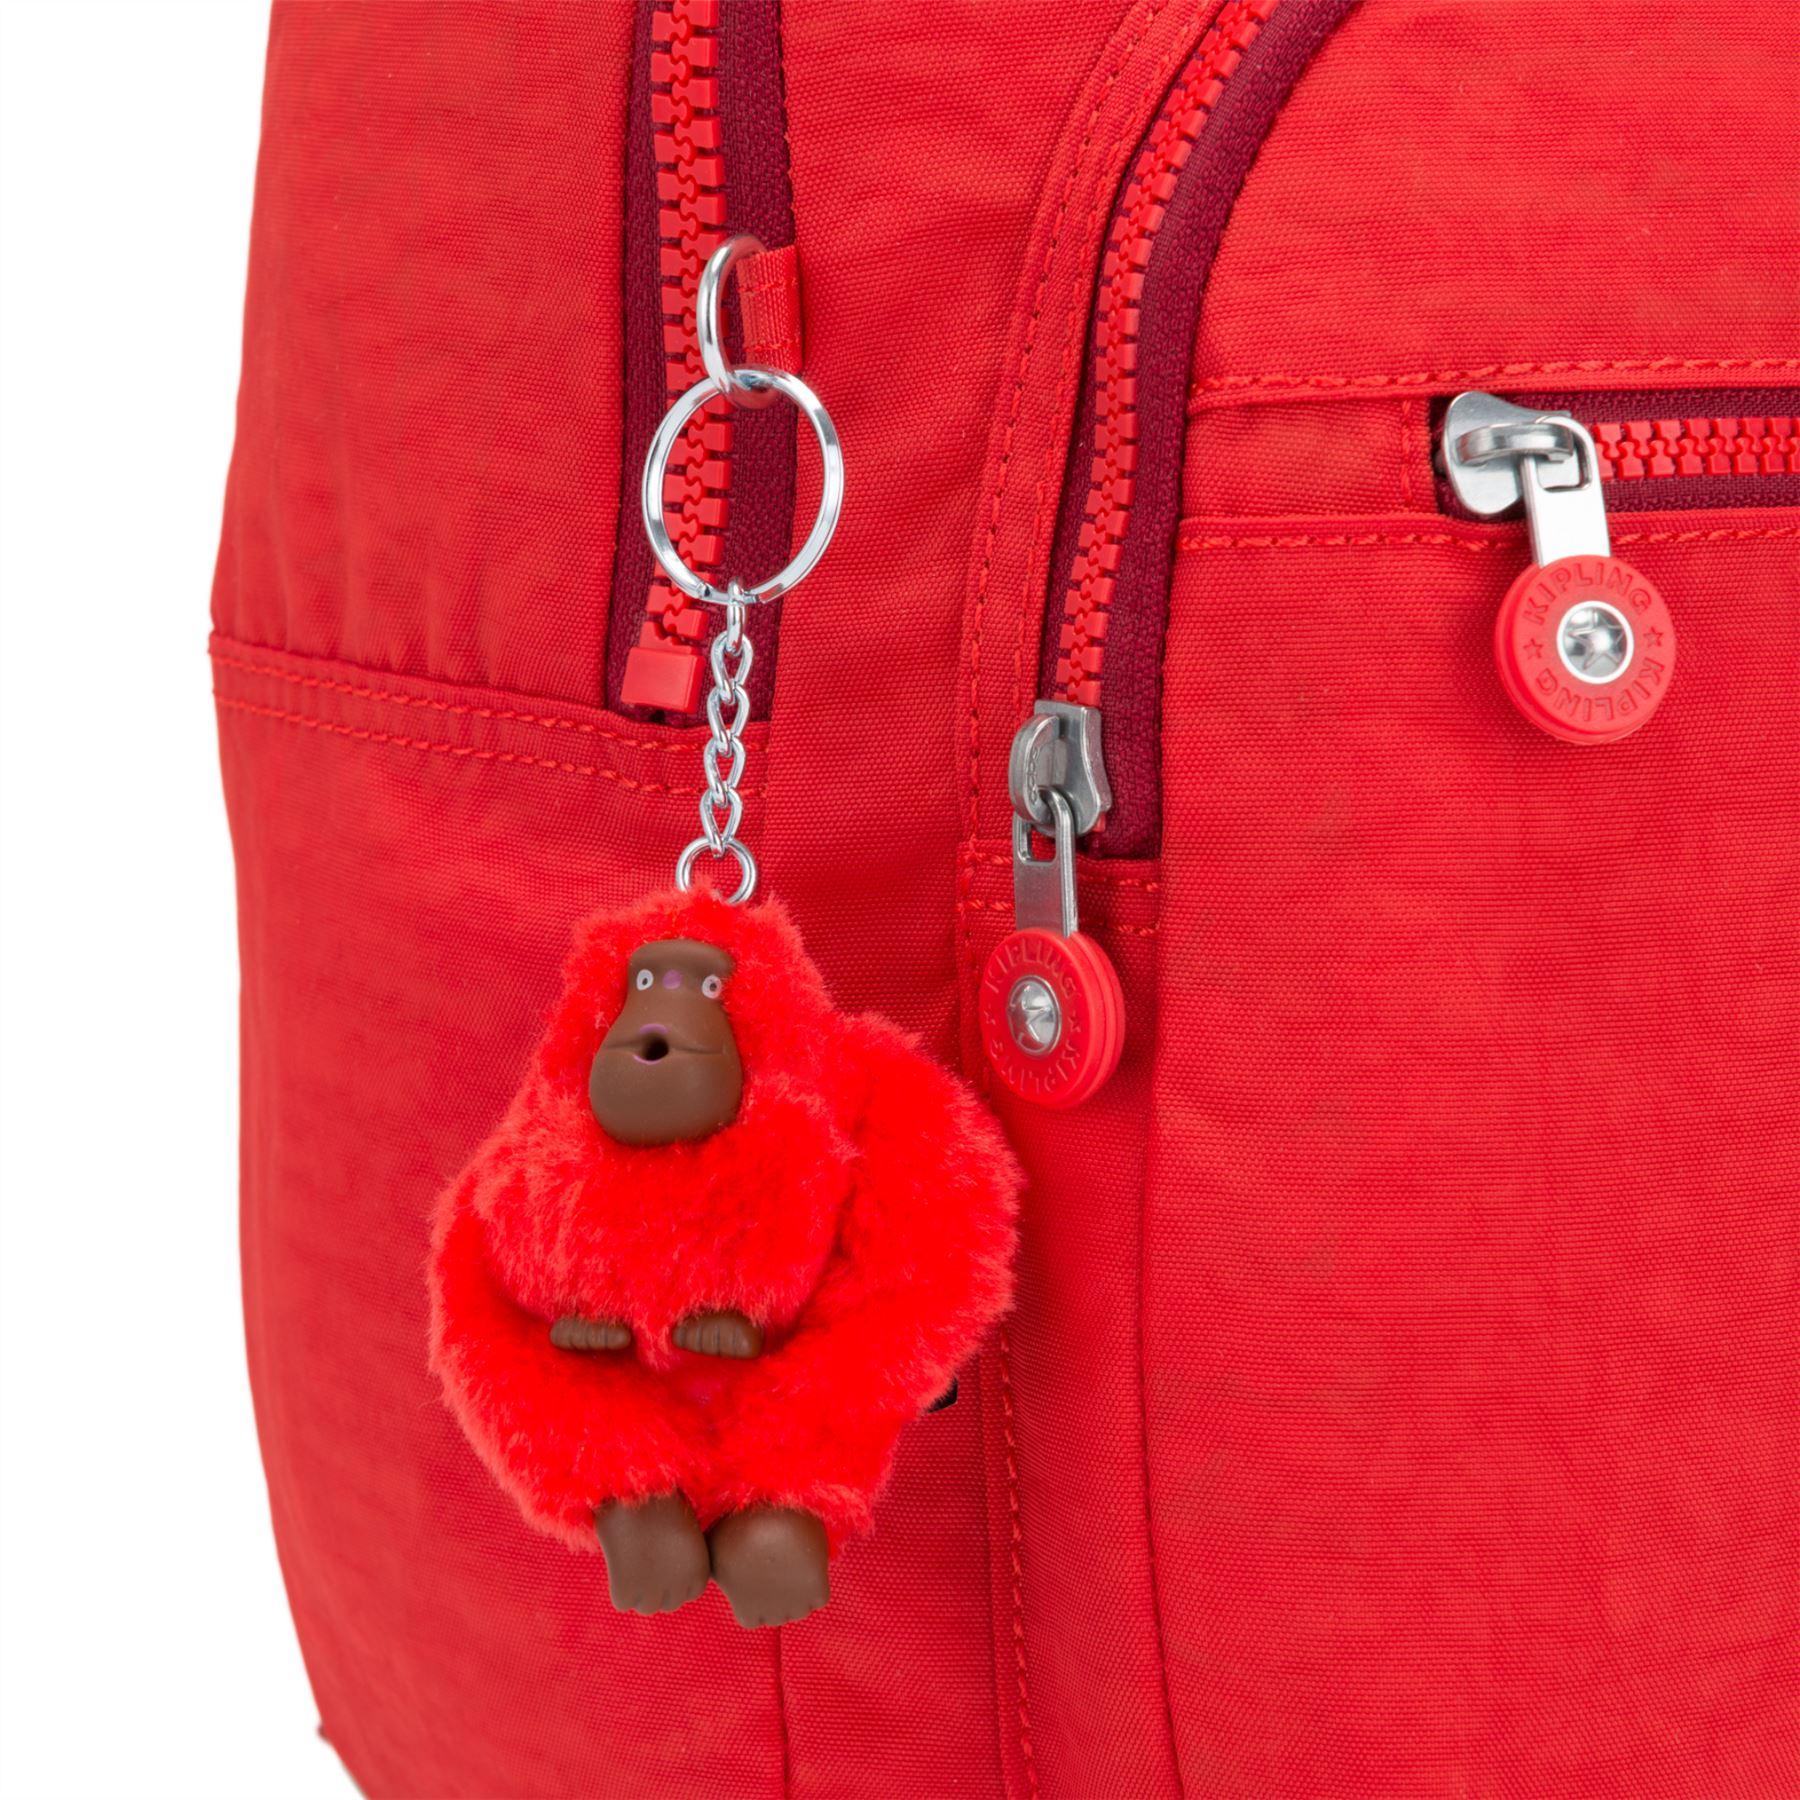 Kipling Clas Seoul S Small Womens Backpacks Rucksack NEW 2019 Colours